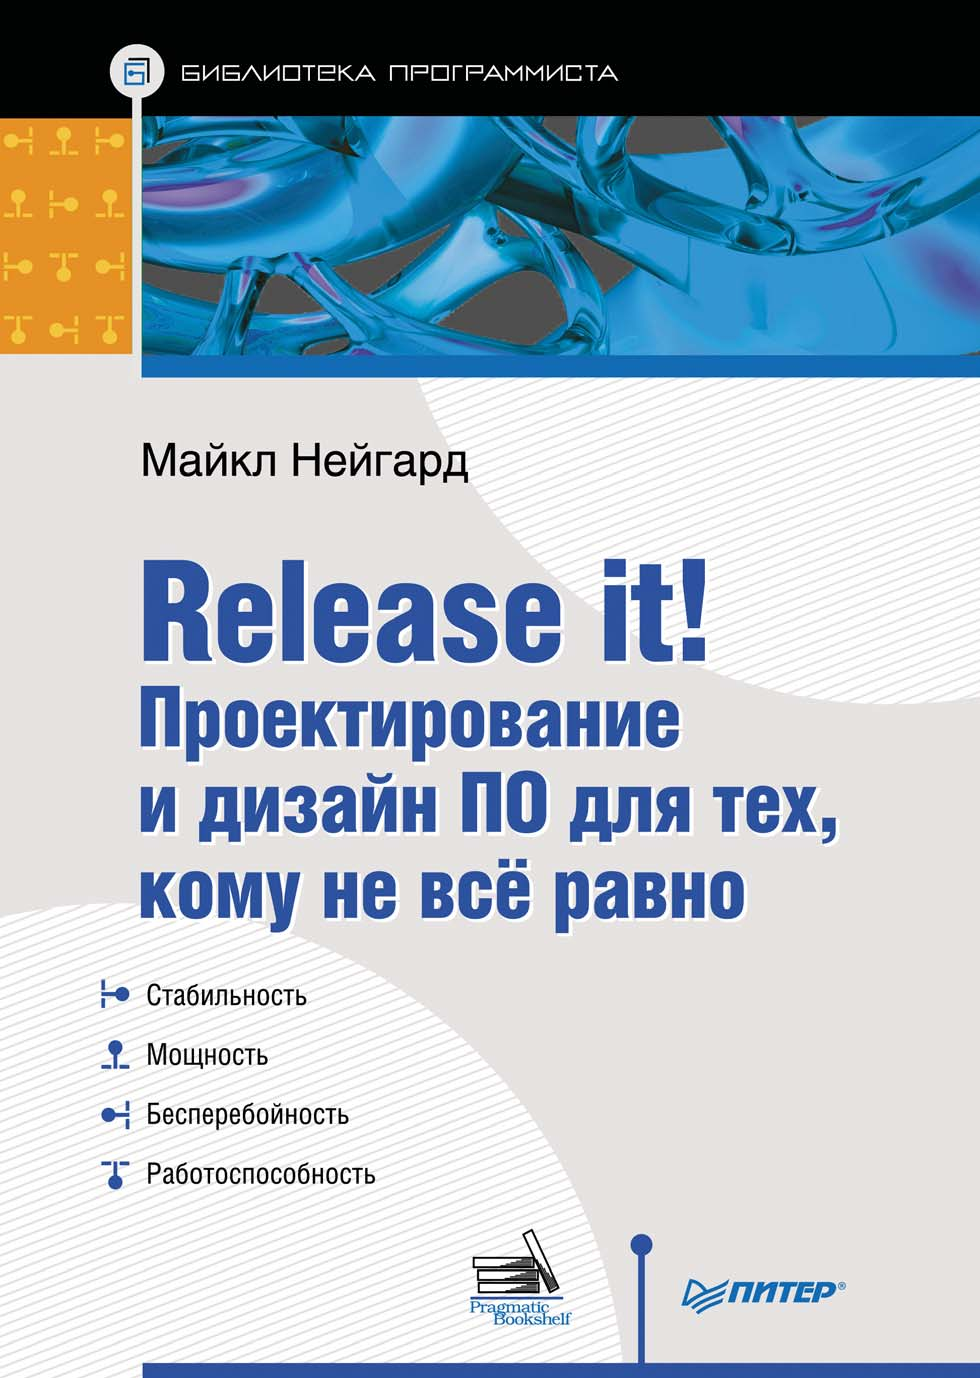 "<a href=""https://www.ozon.ru/context/detail/id/135464861/"" target=""_blank"" rel=""noopener noreferrer nofollow"">Нейгард М. Release it! Проектирование и дизайн ПО для тех, кому не все равно</a>"